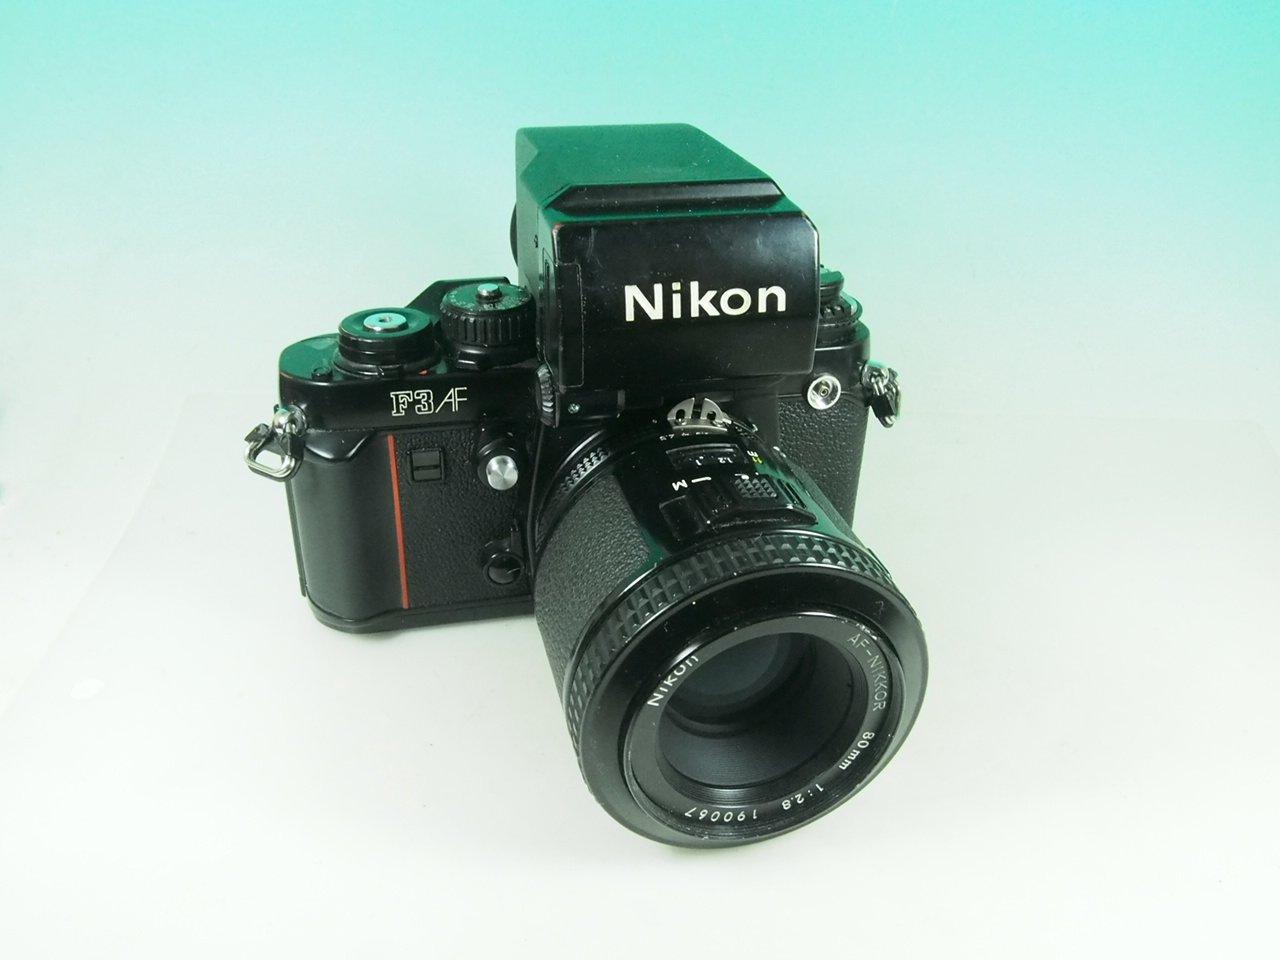 nikon F3AF 80mmF2.8付き   B00DPOHVIC